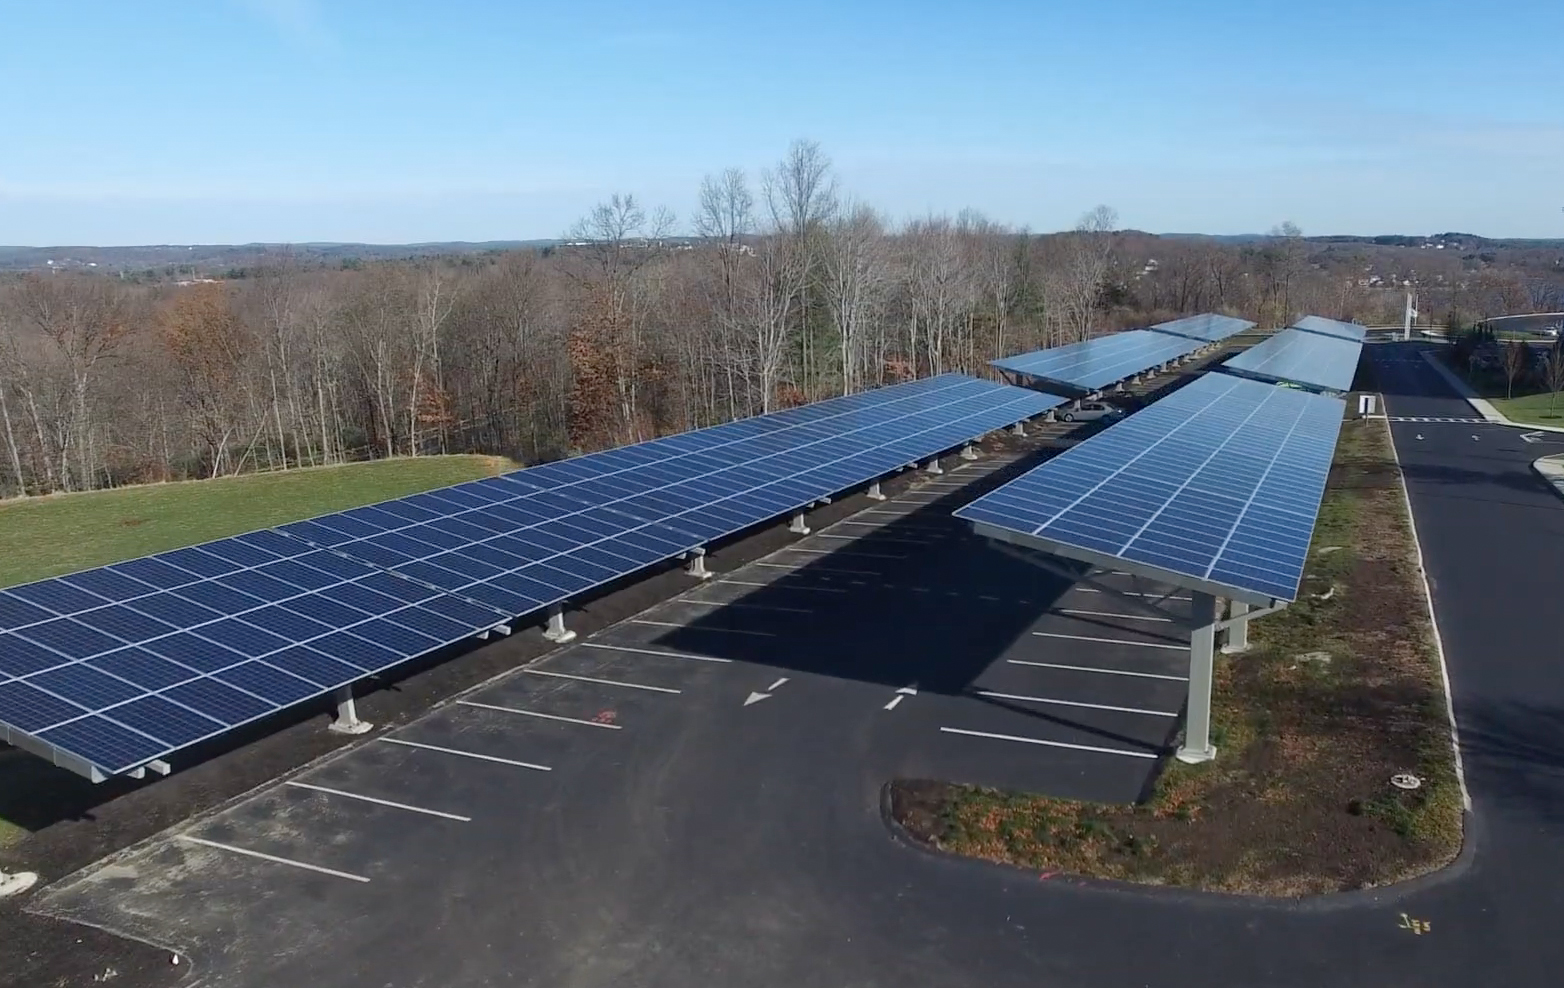 Solar Carport Optimization - Part 2 of 2